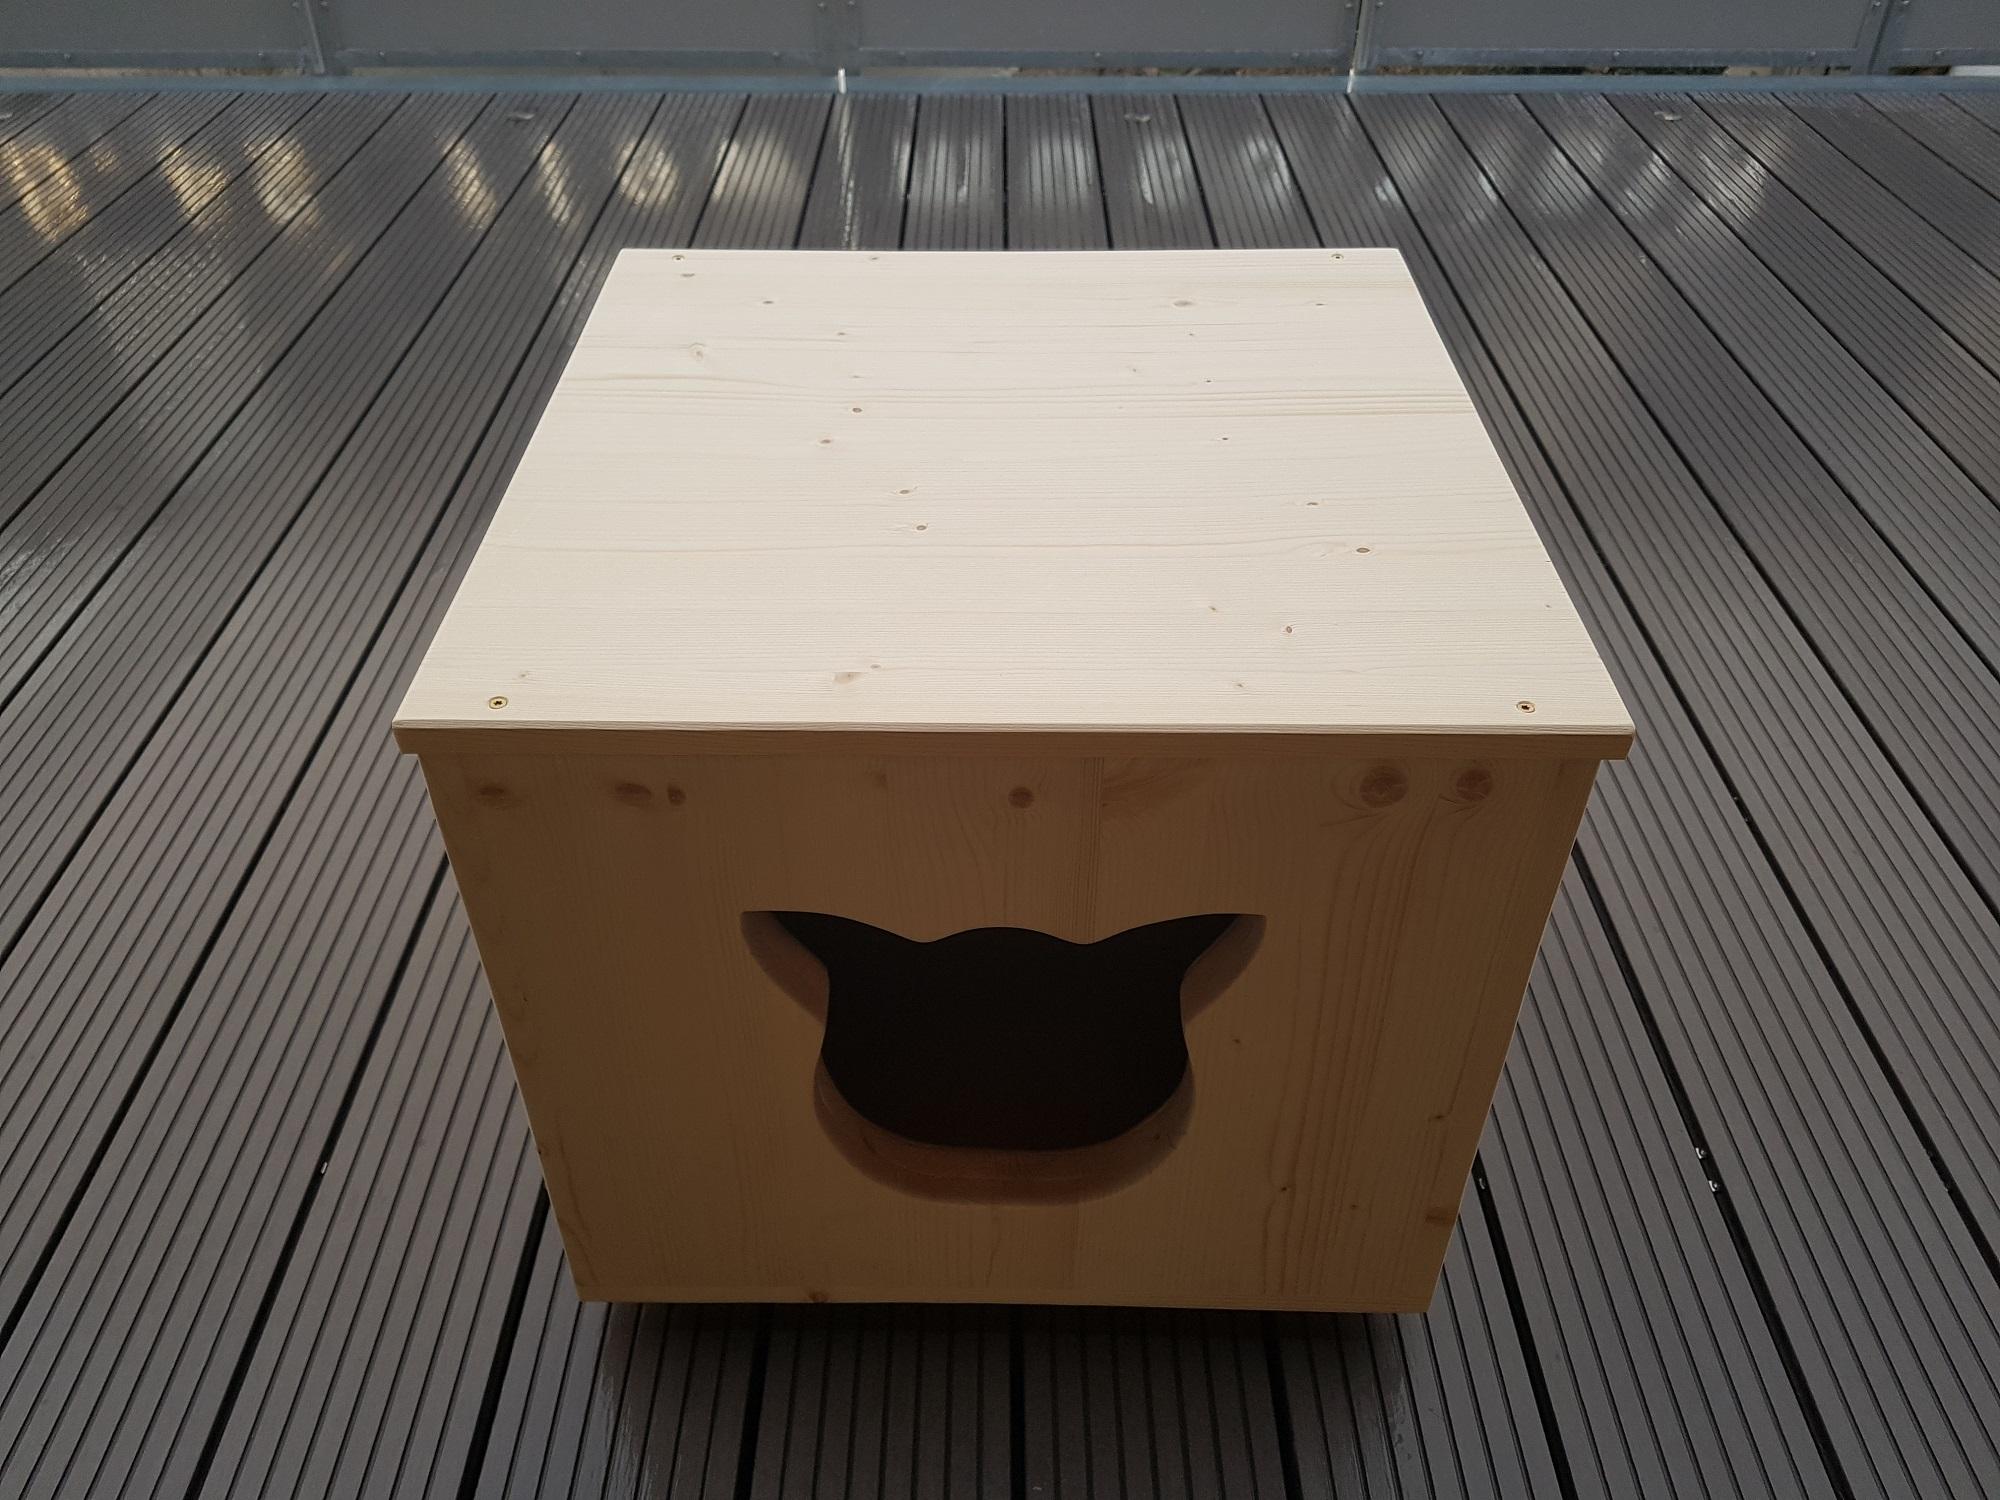 katzenh hle f r au en kuschelbett f r katzen kissen f r. Black Bedroom Furniture Sets. Home Design Ideas